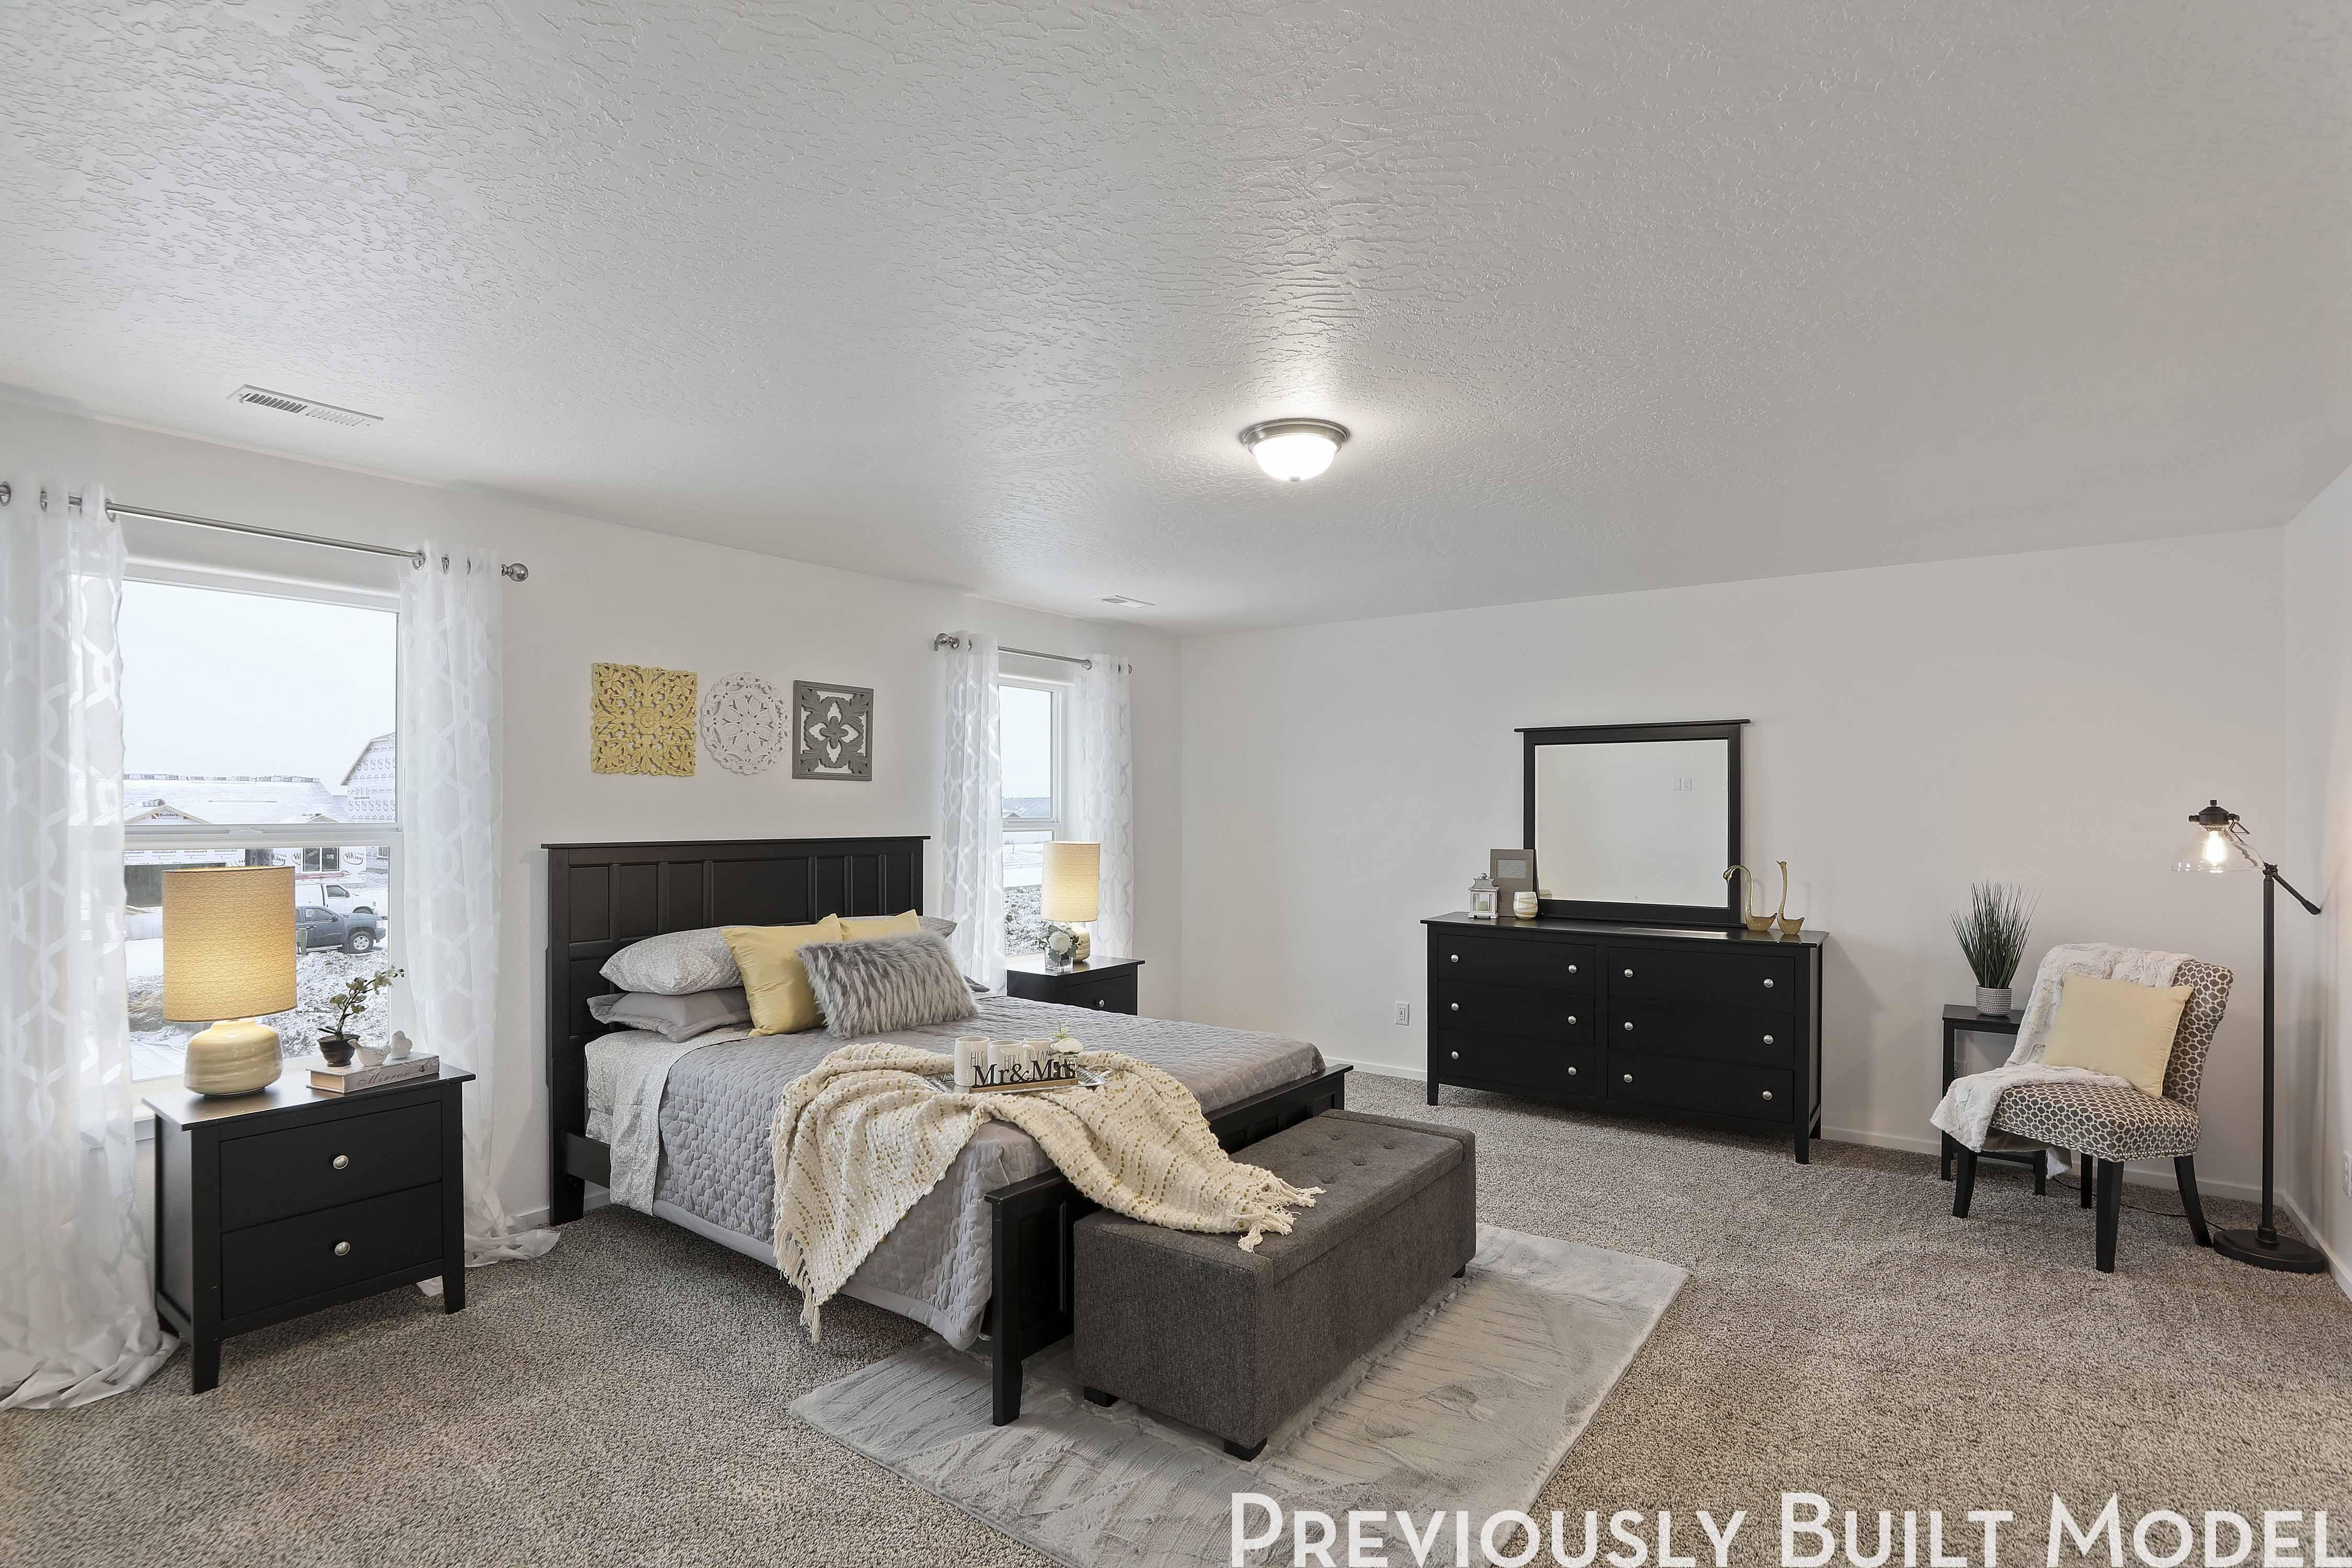 Bedroom featured in The Windsor By RYN Built Homes in Spokane-Couer d Alene, WA